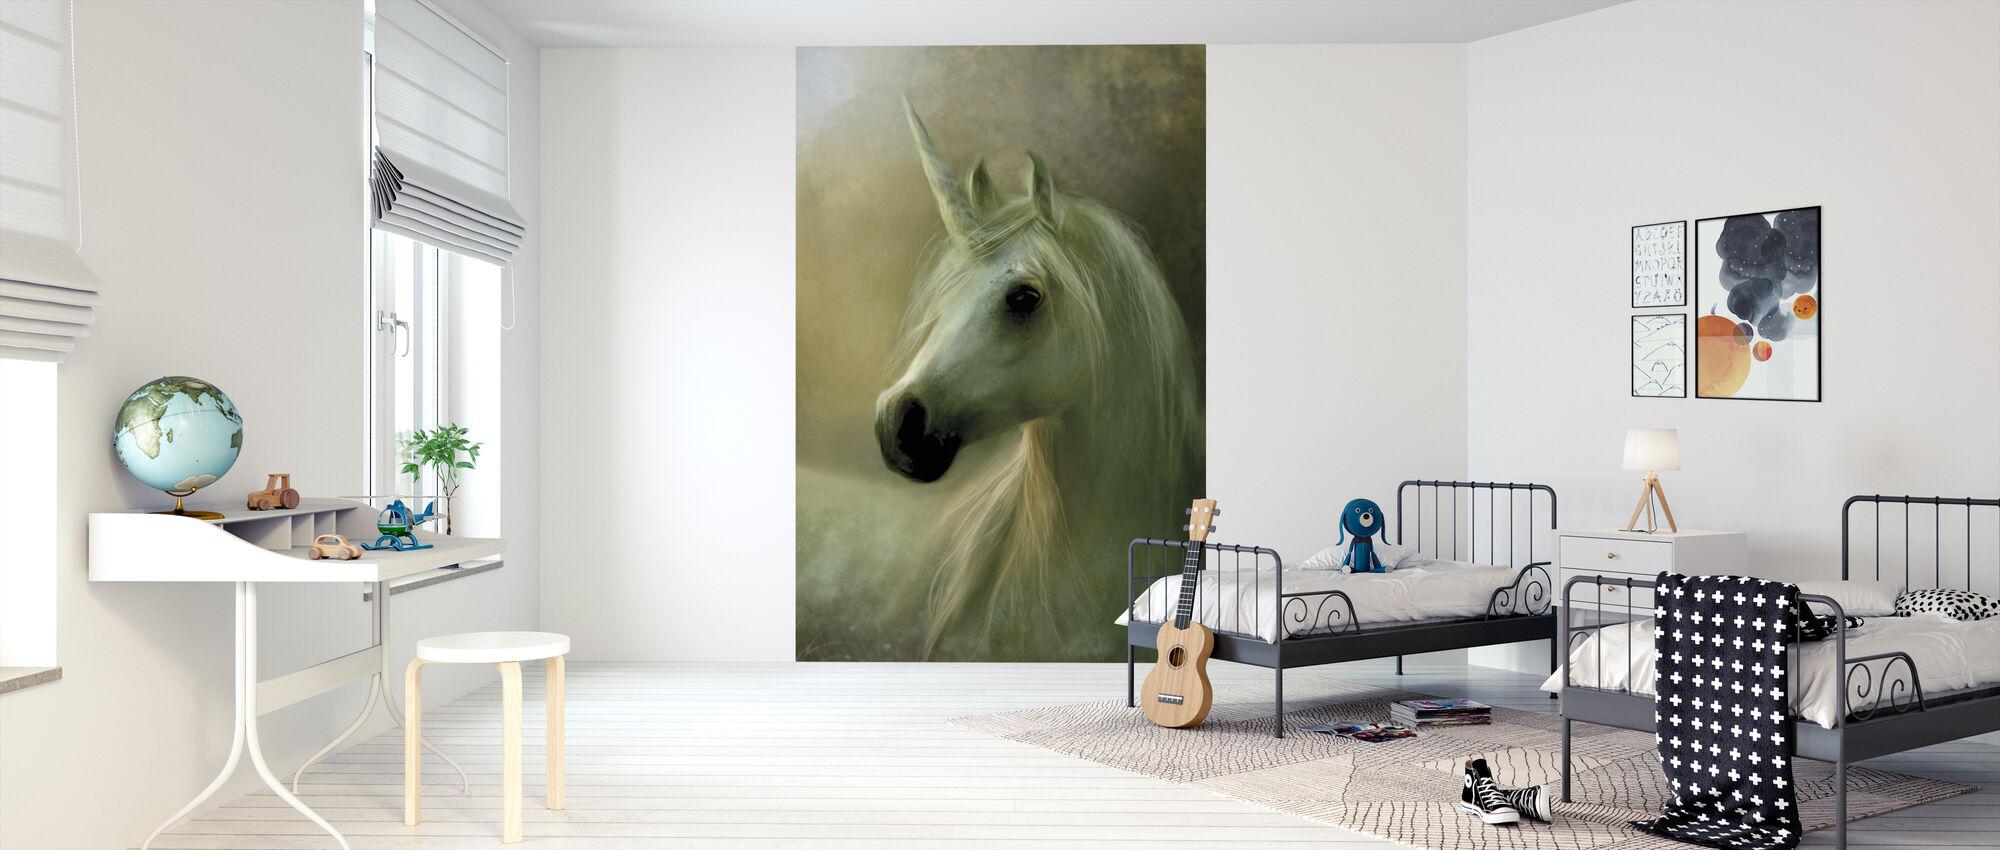 Elegance - Wallpaper - Kids Room